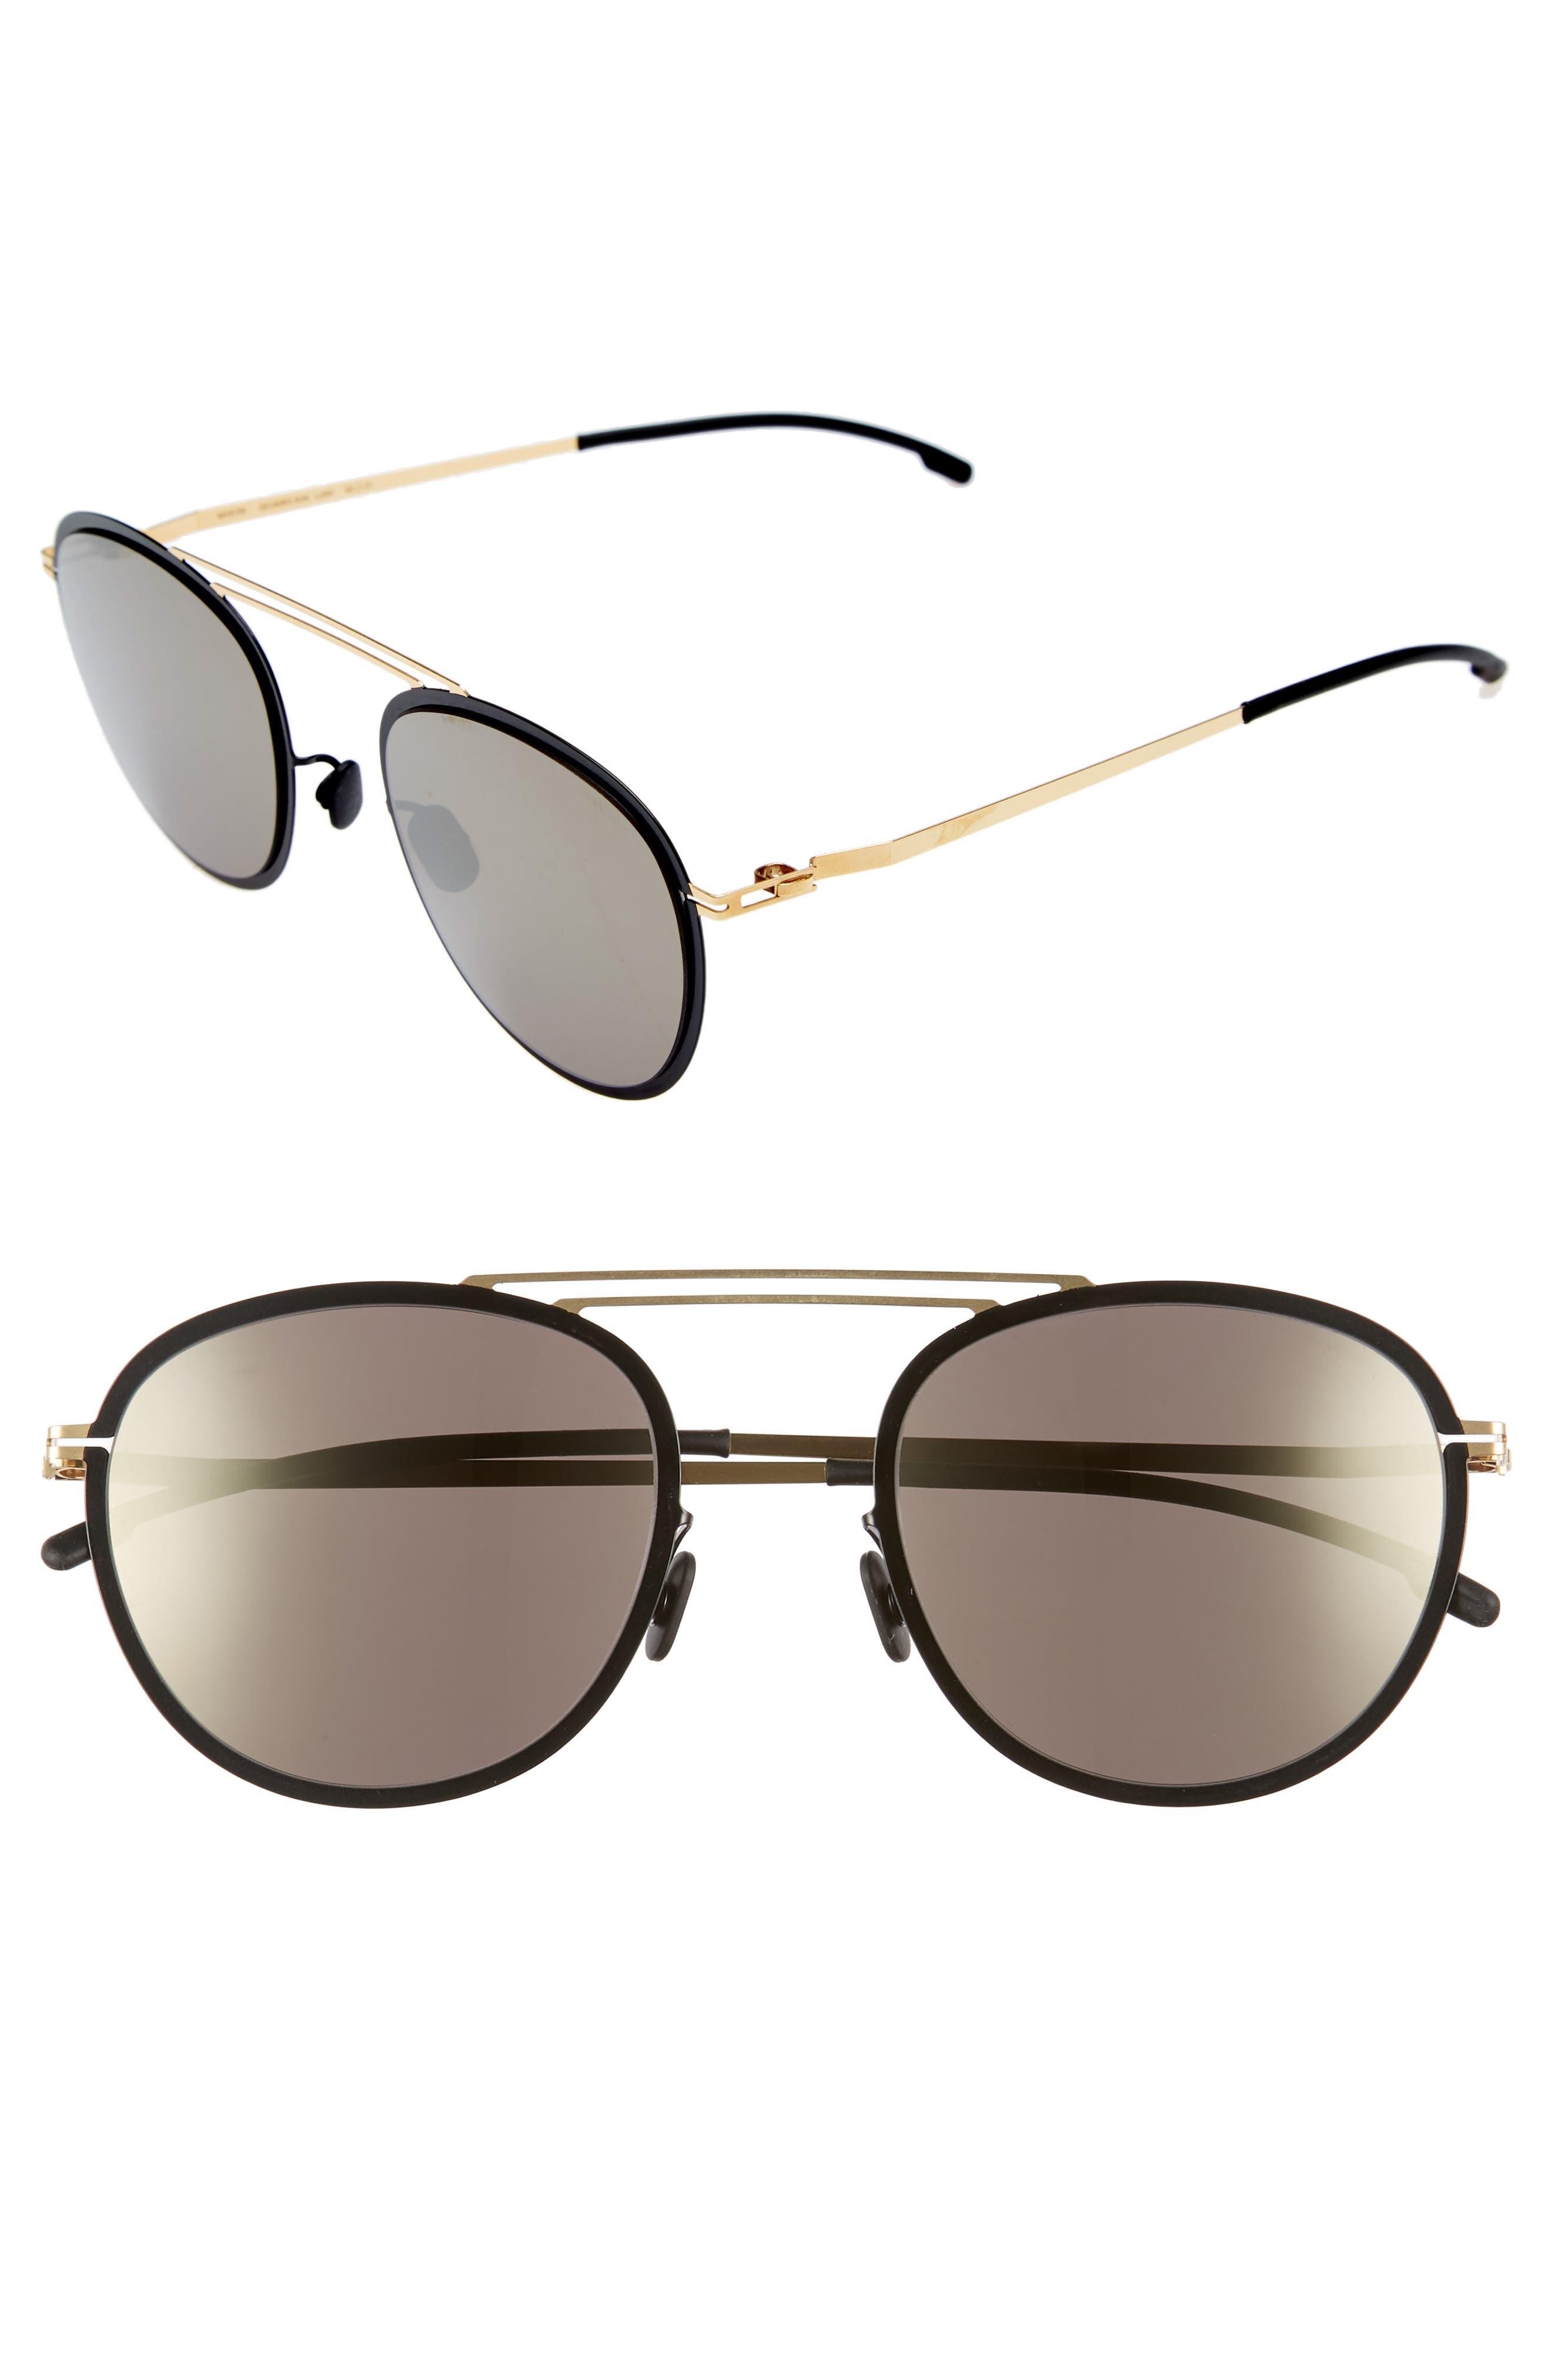 Luigi 52mm Aviator Sunglasses,                         Main,                         color, Gold/ Jet Black